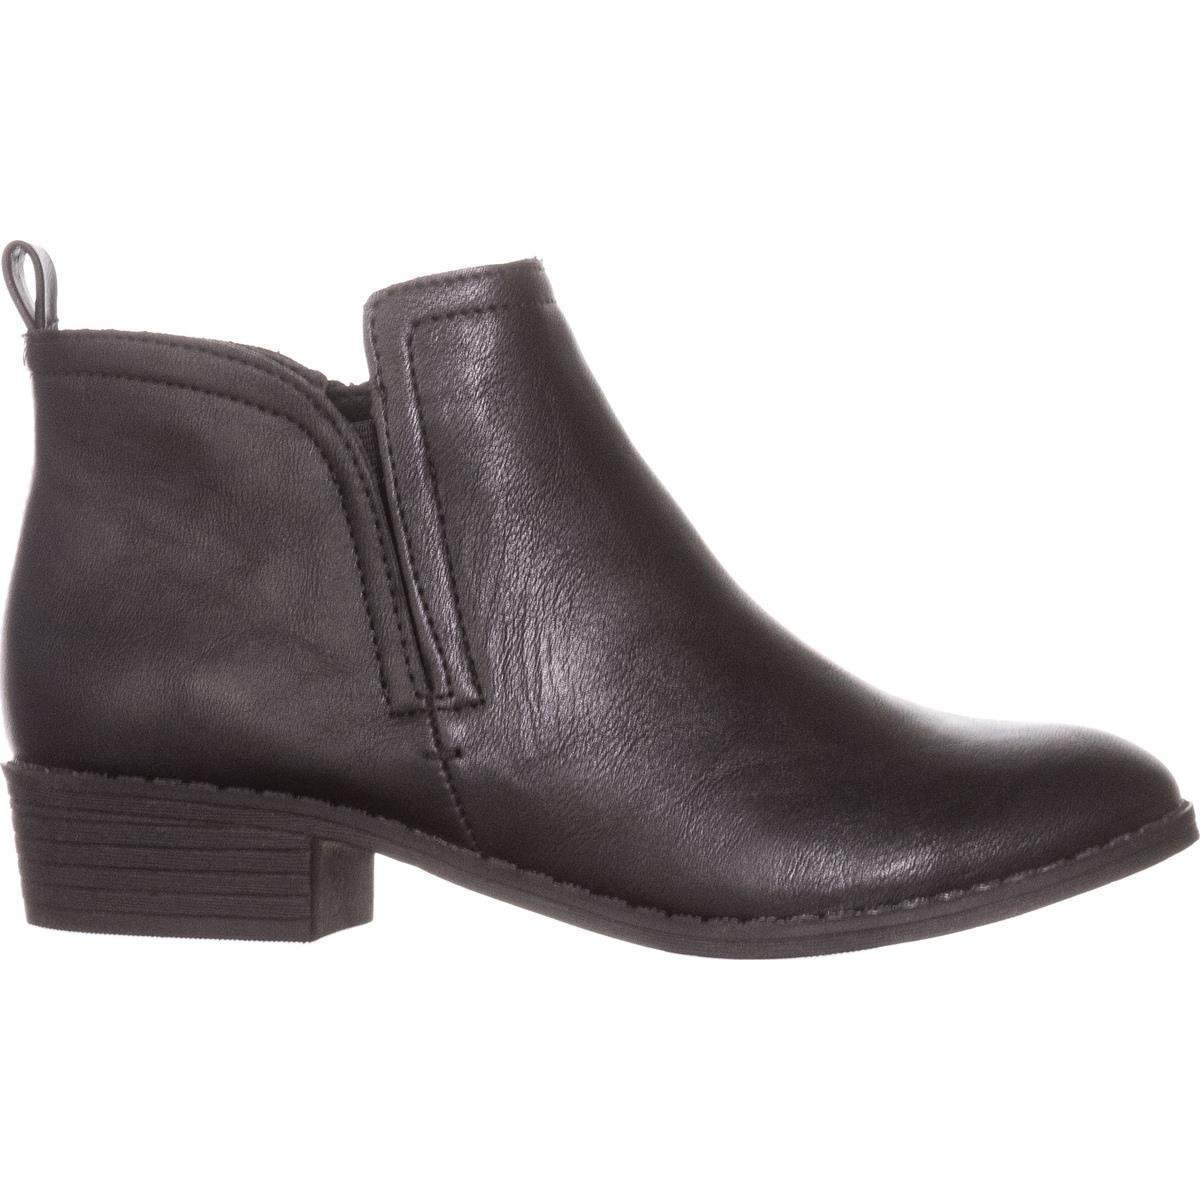 American Rag Cadee Cadee Cadee Ankle Stiefelies schwarz 10M 9cd568